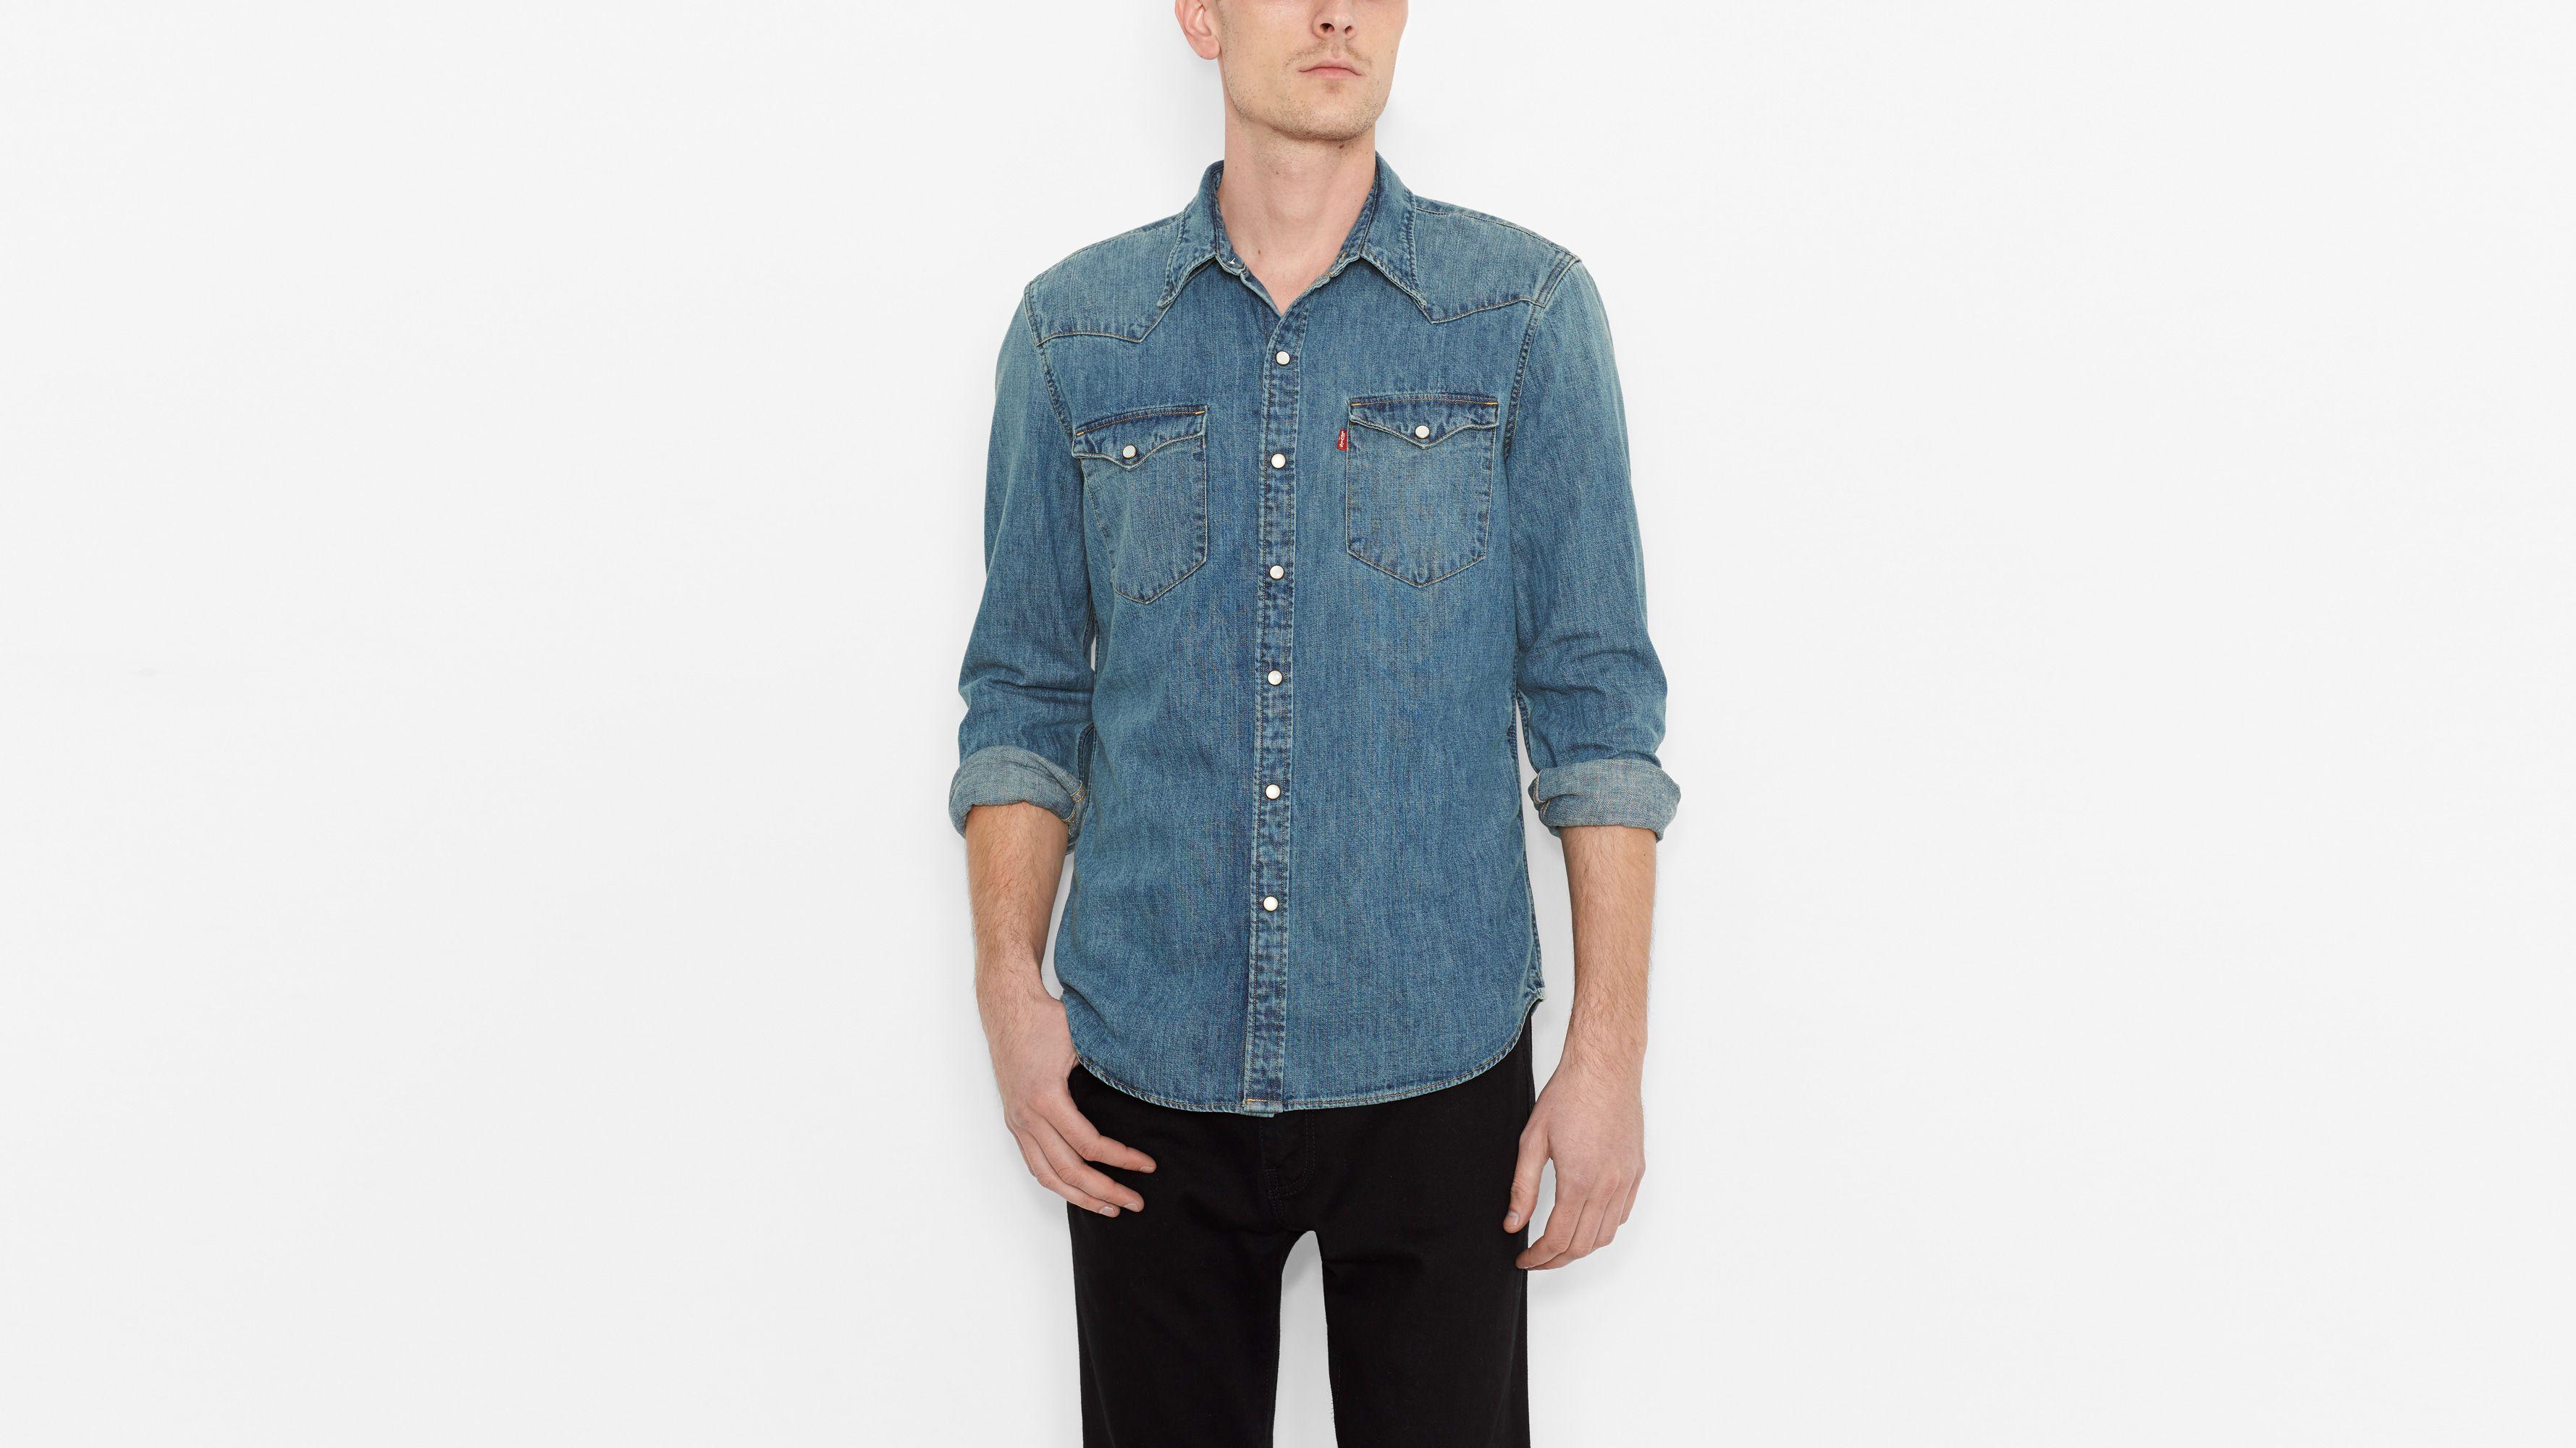 Barstow Western Shirt - Stonewash Denim